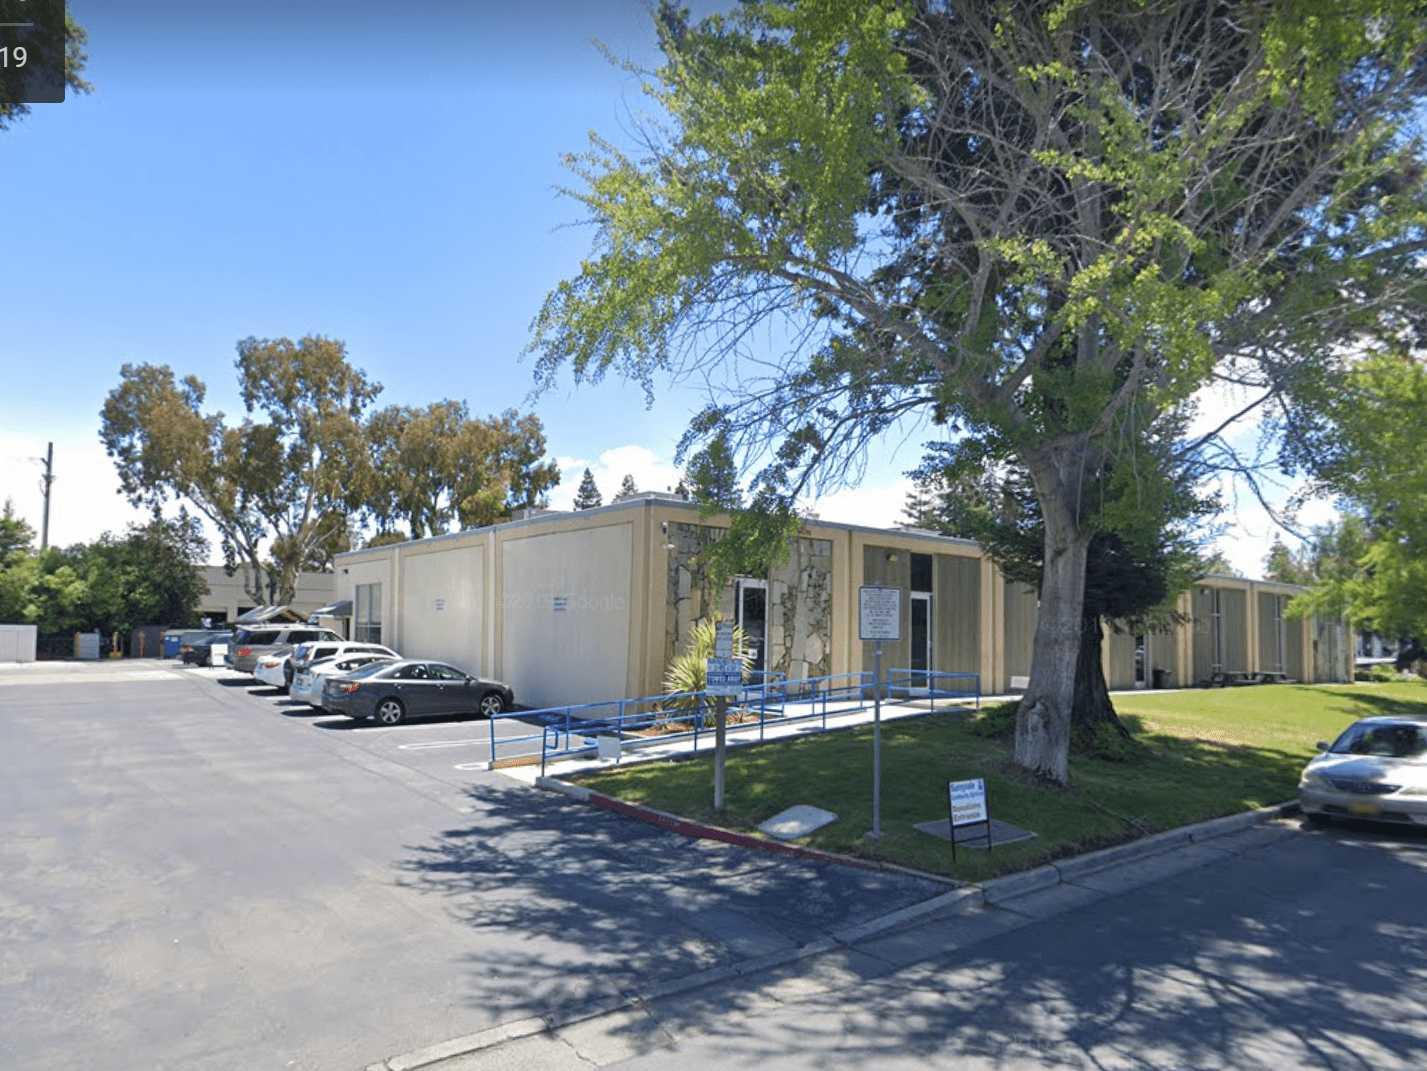 Sunnyvale Community Services